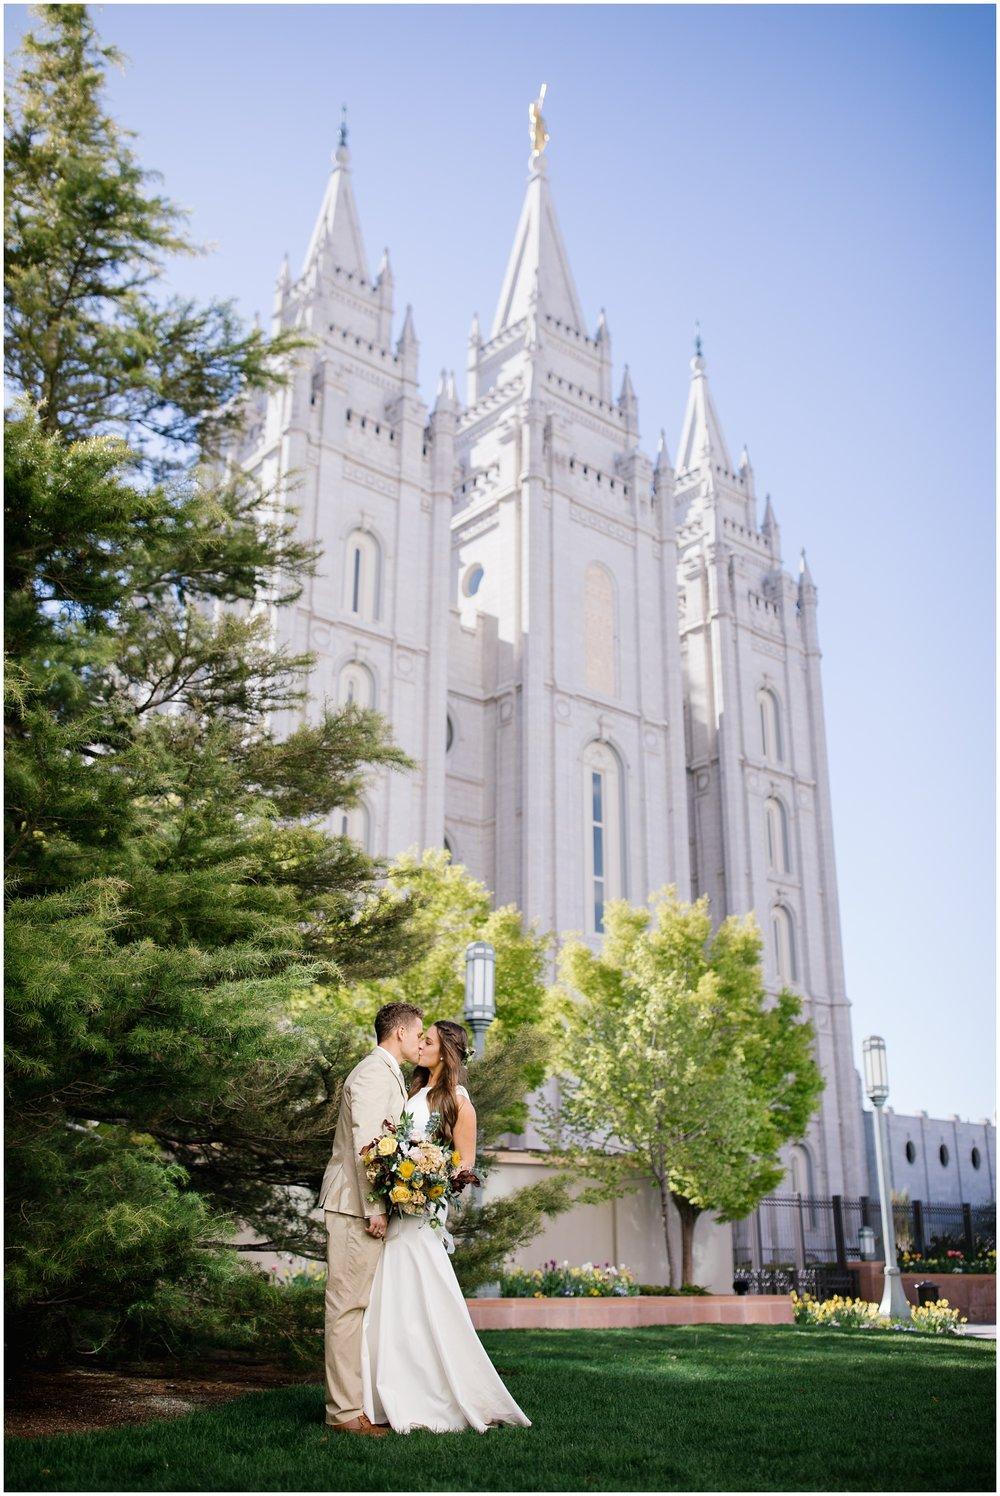 JC-Wedding-203_Lizzie-B-Imagery-Utah-Wedding-Photographer-Park-City-Salt-Lake-City-Temple-Joseph-Smith-Memorial-Building-Empire-Room.jpg